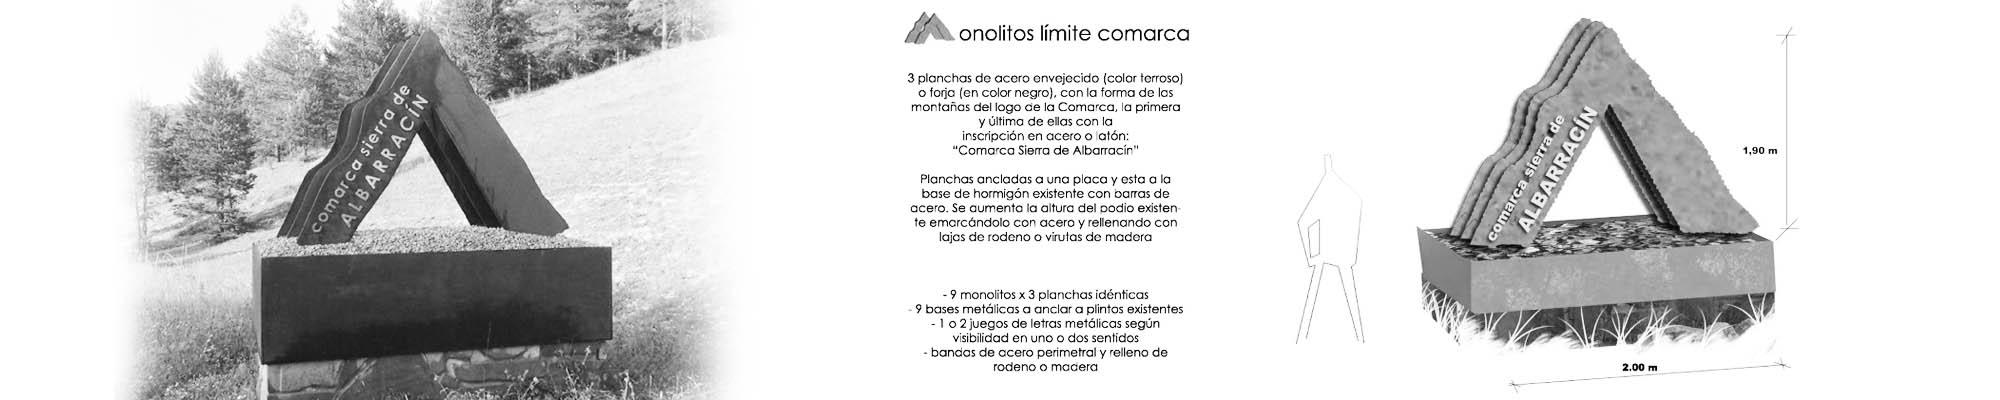 http://www.turiving.es/wp-content/uploads/2017/11/b-05-monolitos.jpg